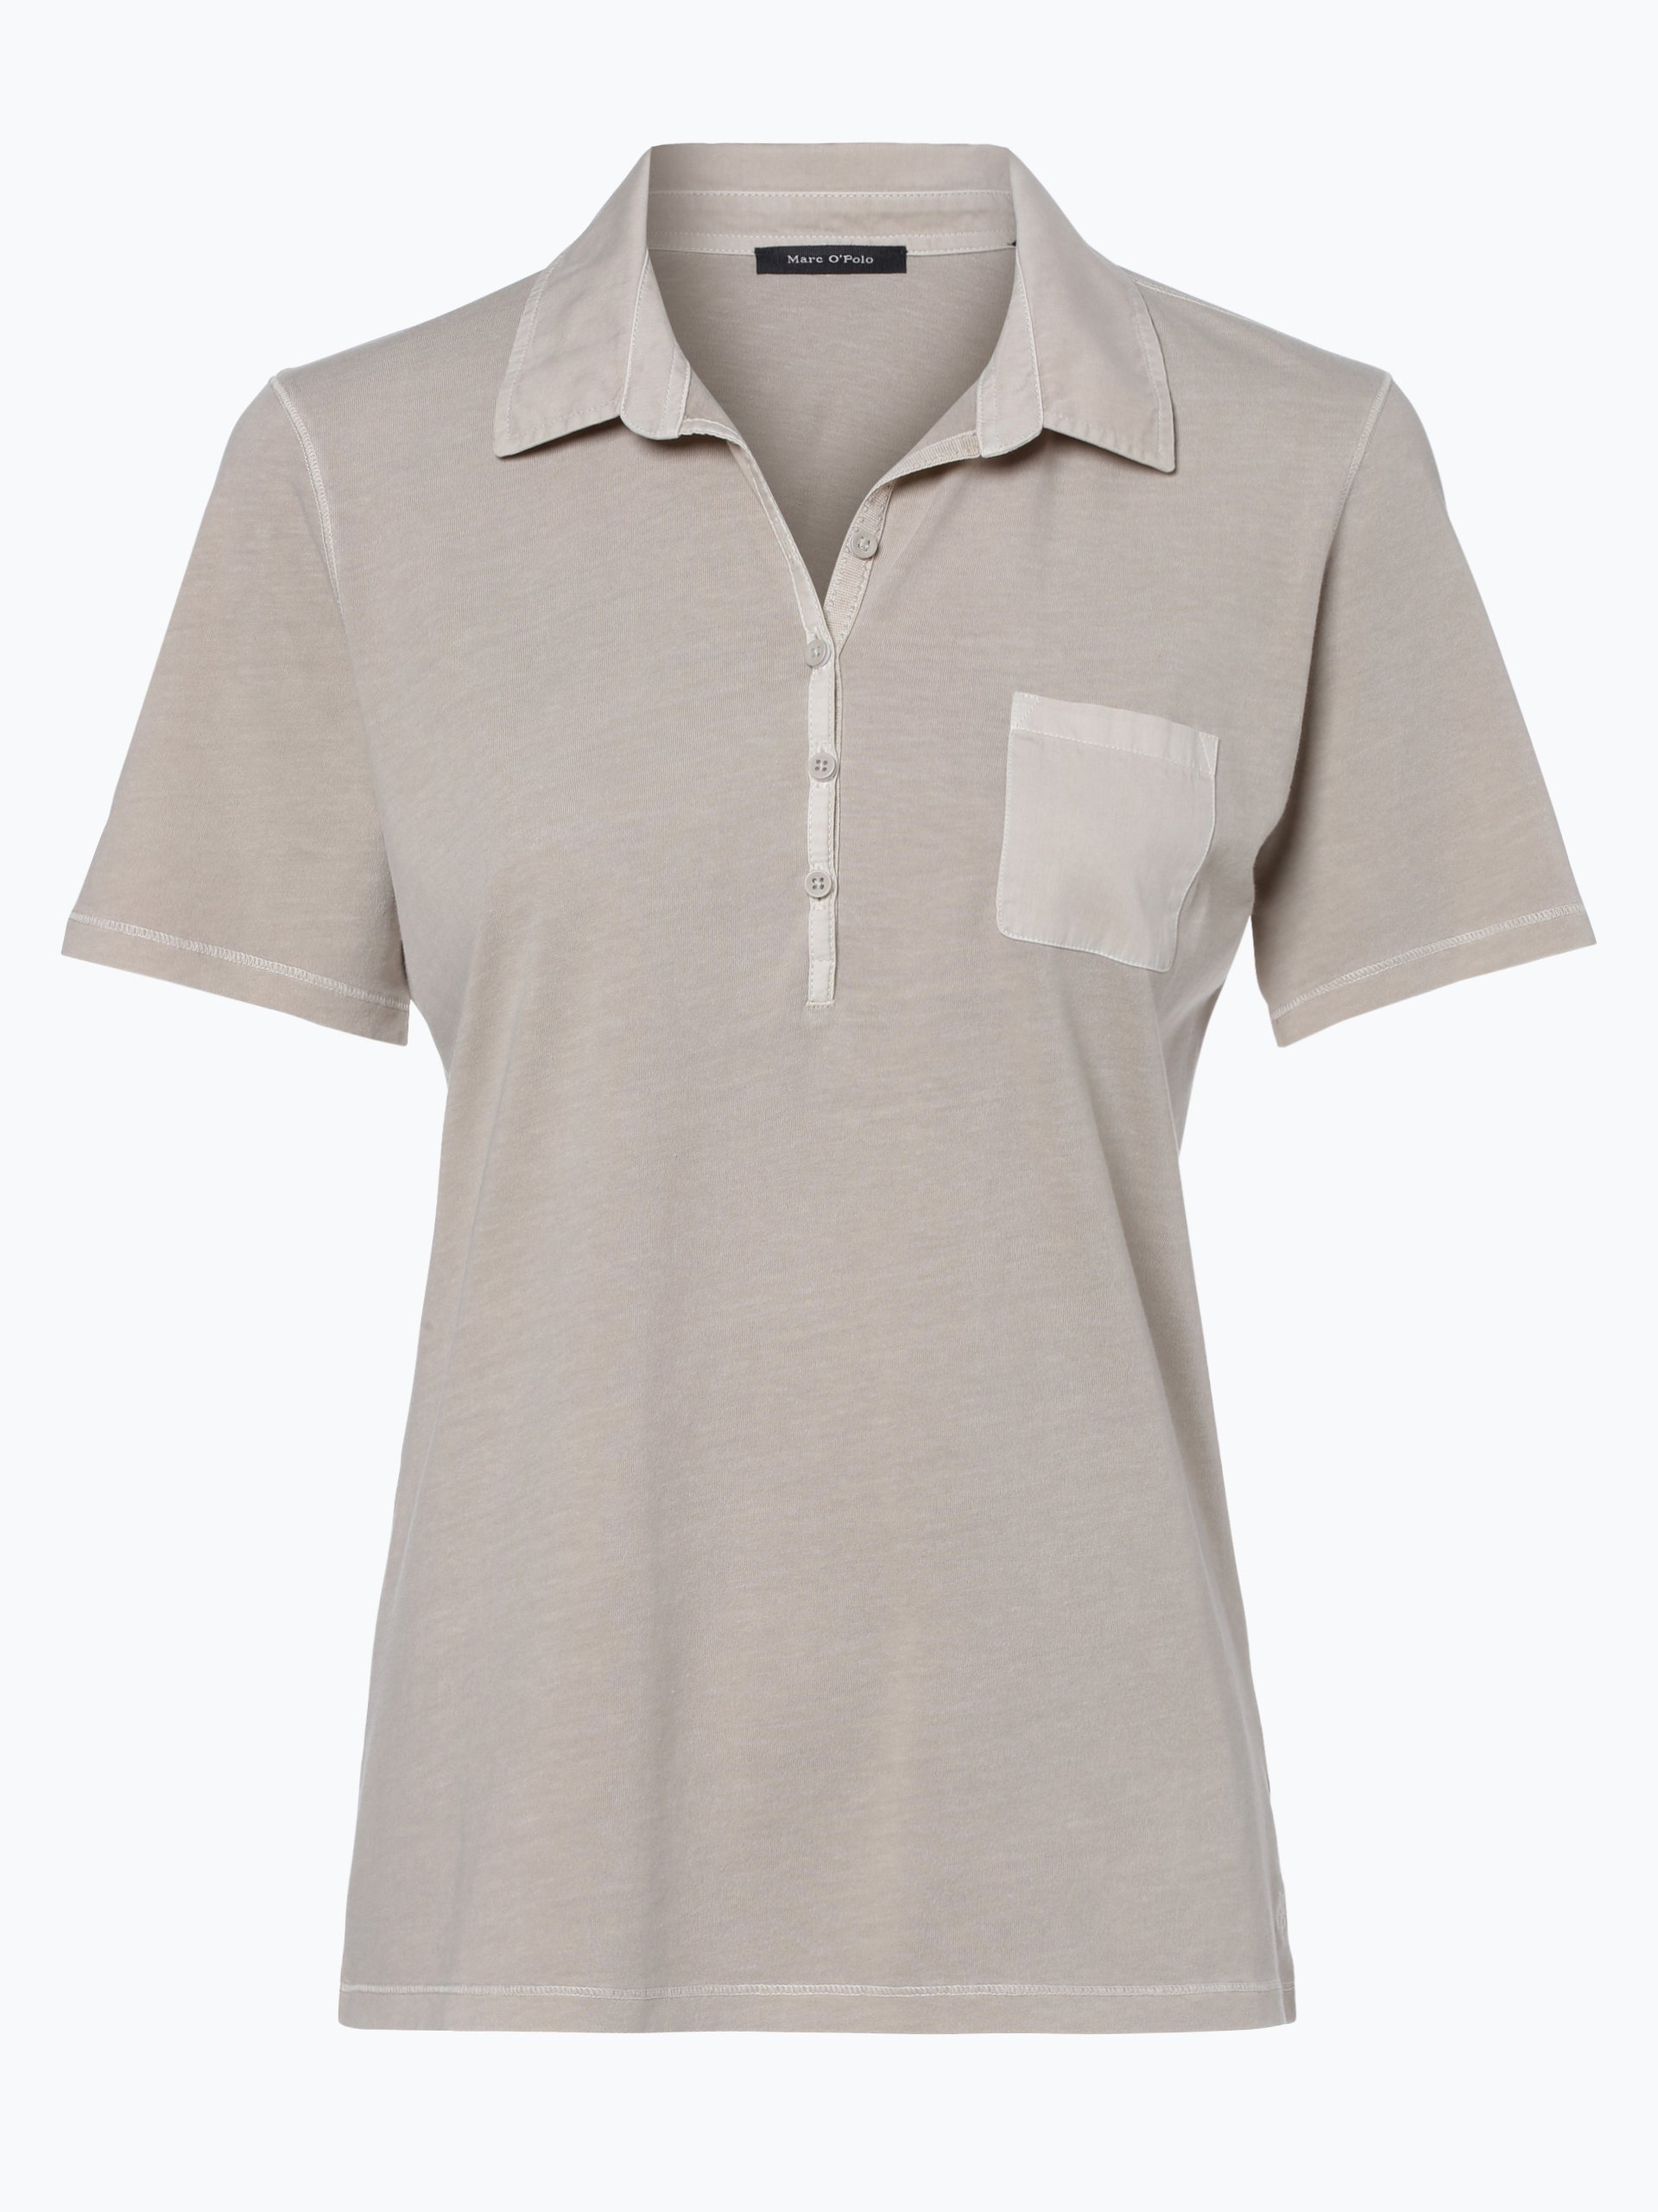 marc o 39 polo damen t shirt beige gestreift online kaufen. Black Bedroom Furniture Sets. Home Design Ideas